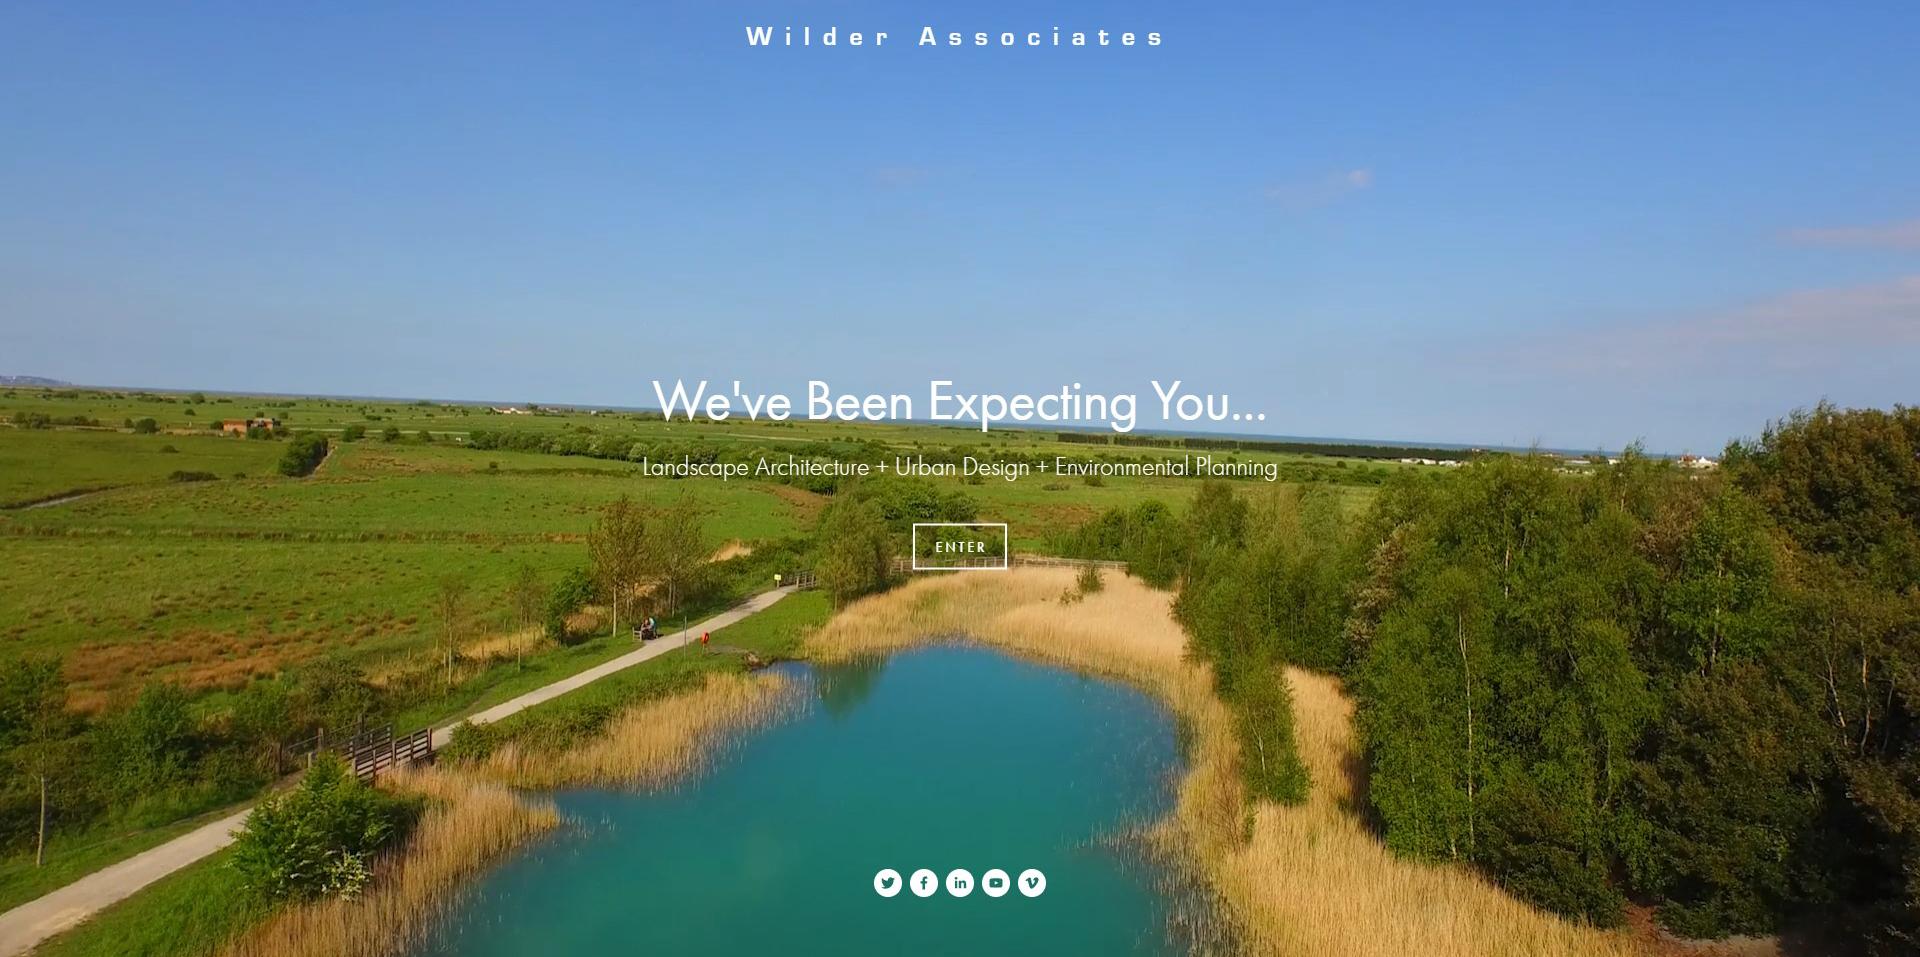 WA Website Intro Video